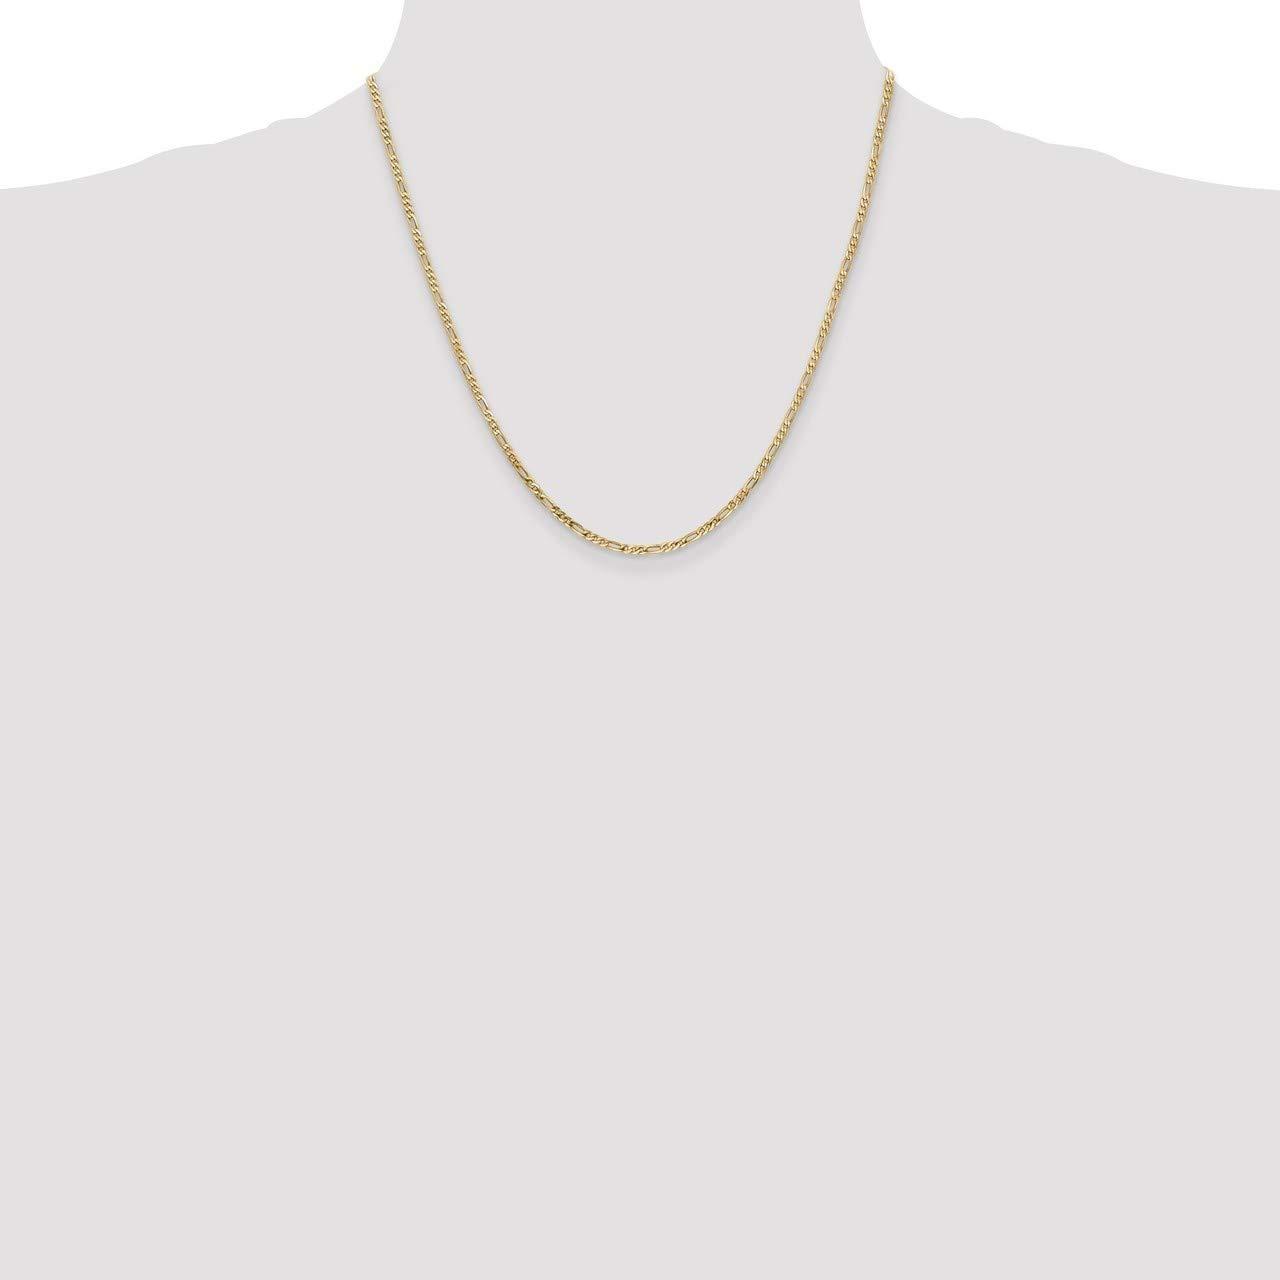 Lex /& Lu 14k Yellow Gold 2.25mm Flat Figaro Chain Necklace or Bracelet